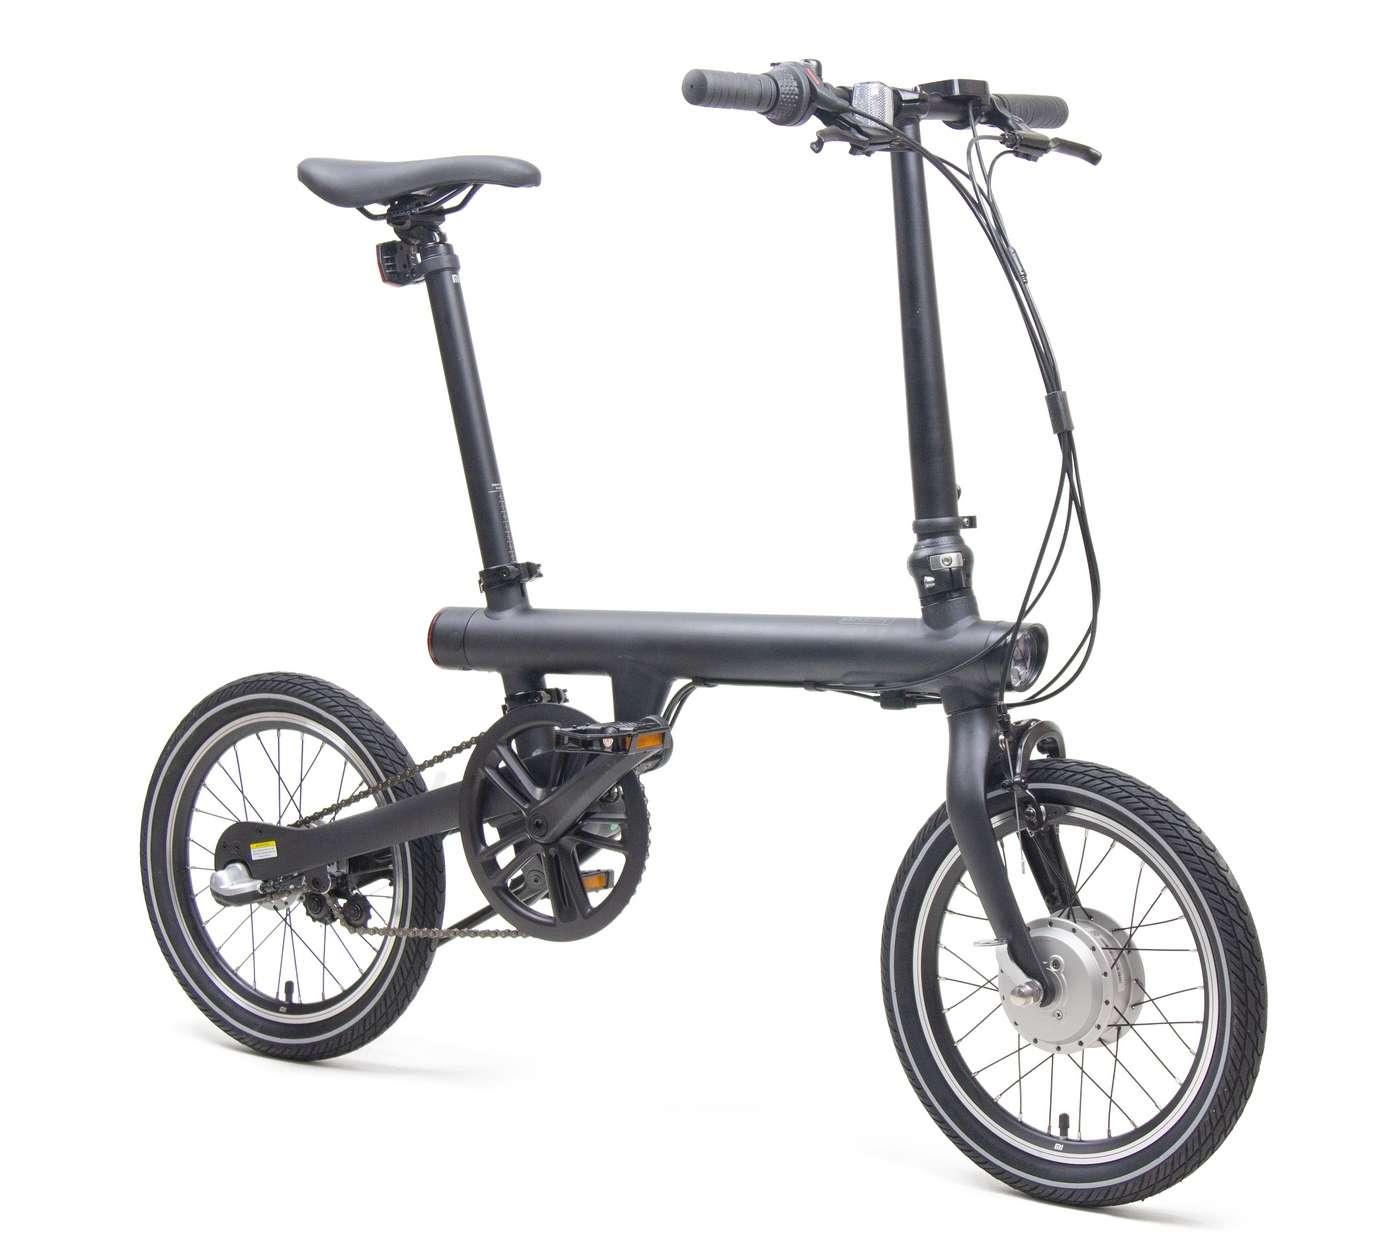 Le Mi Smart Electric Folding Bike de Xiaomi © Xiaomi